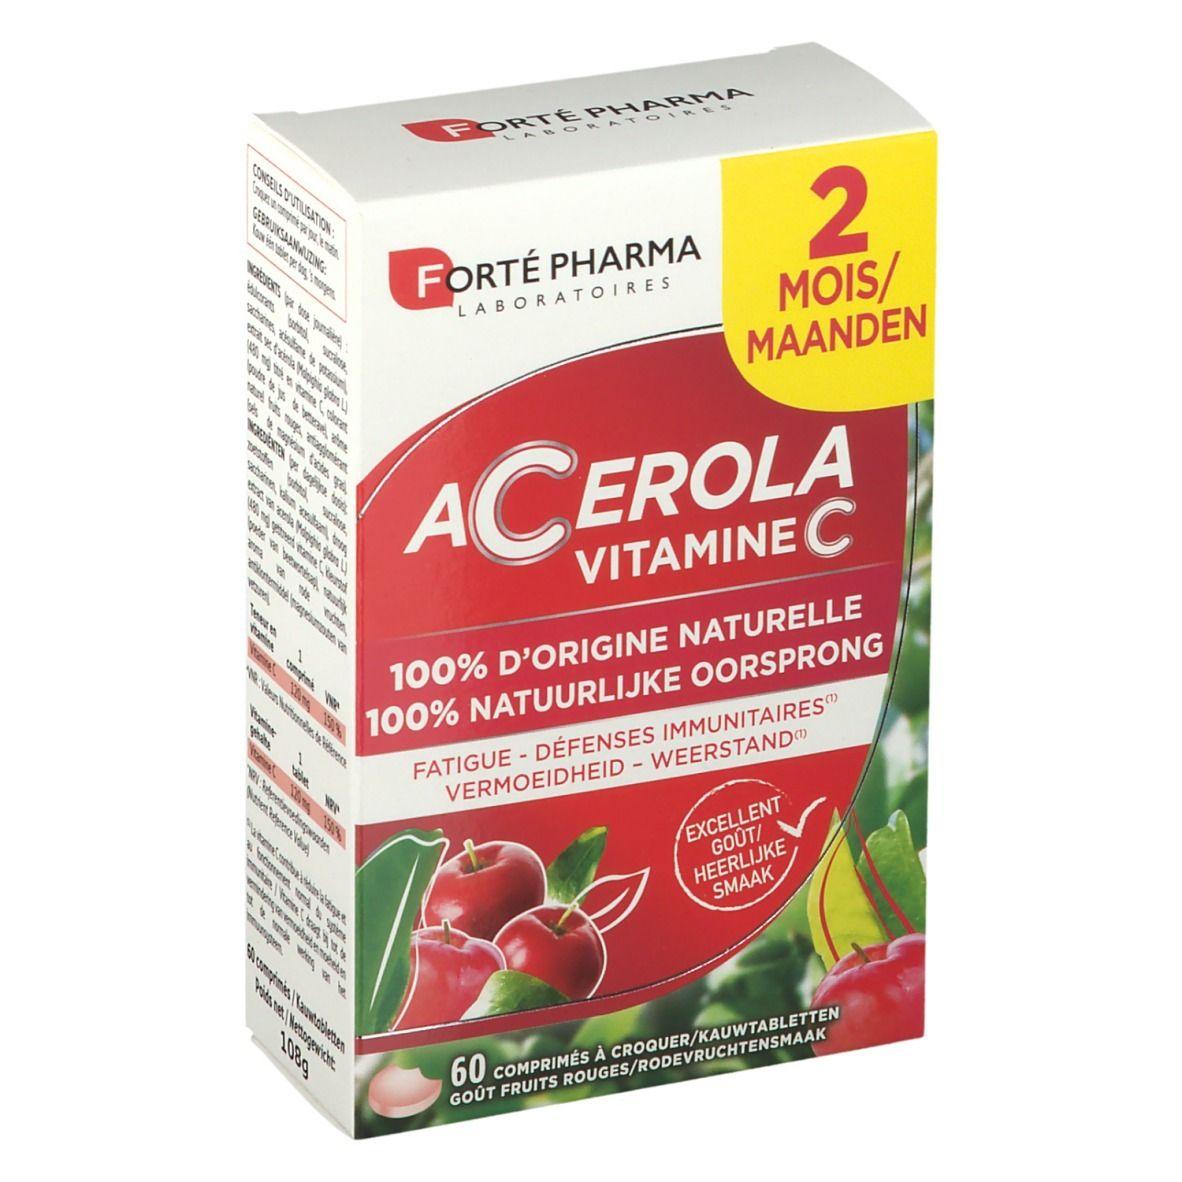 Forté Pharma Acerola Vitamine C